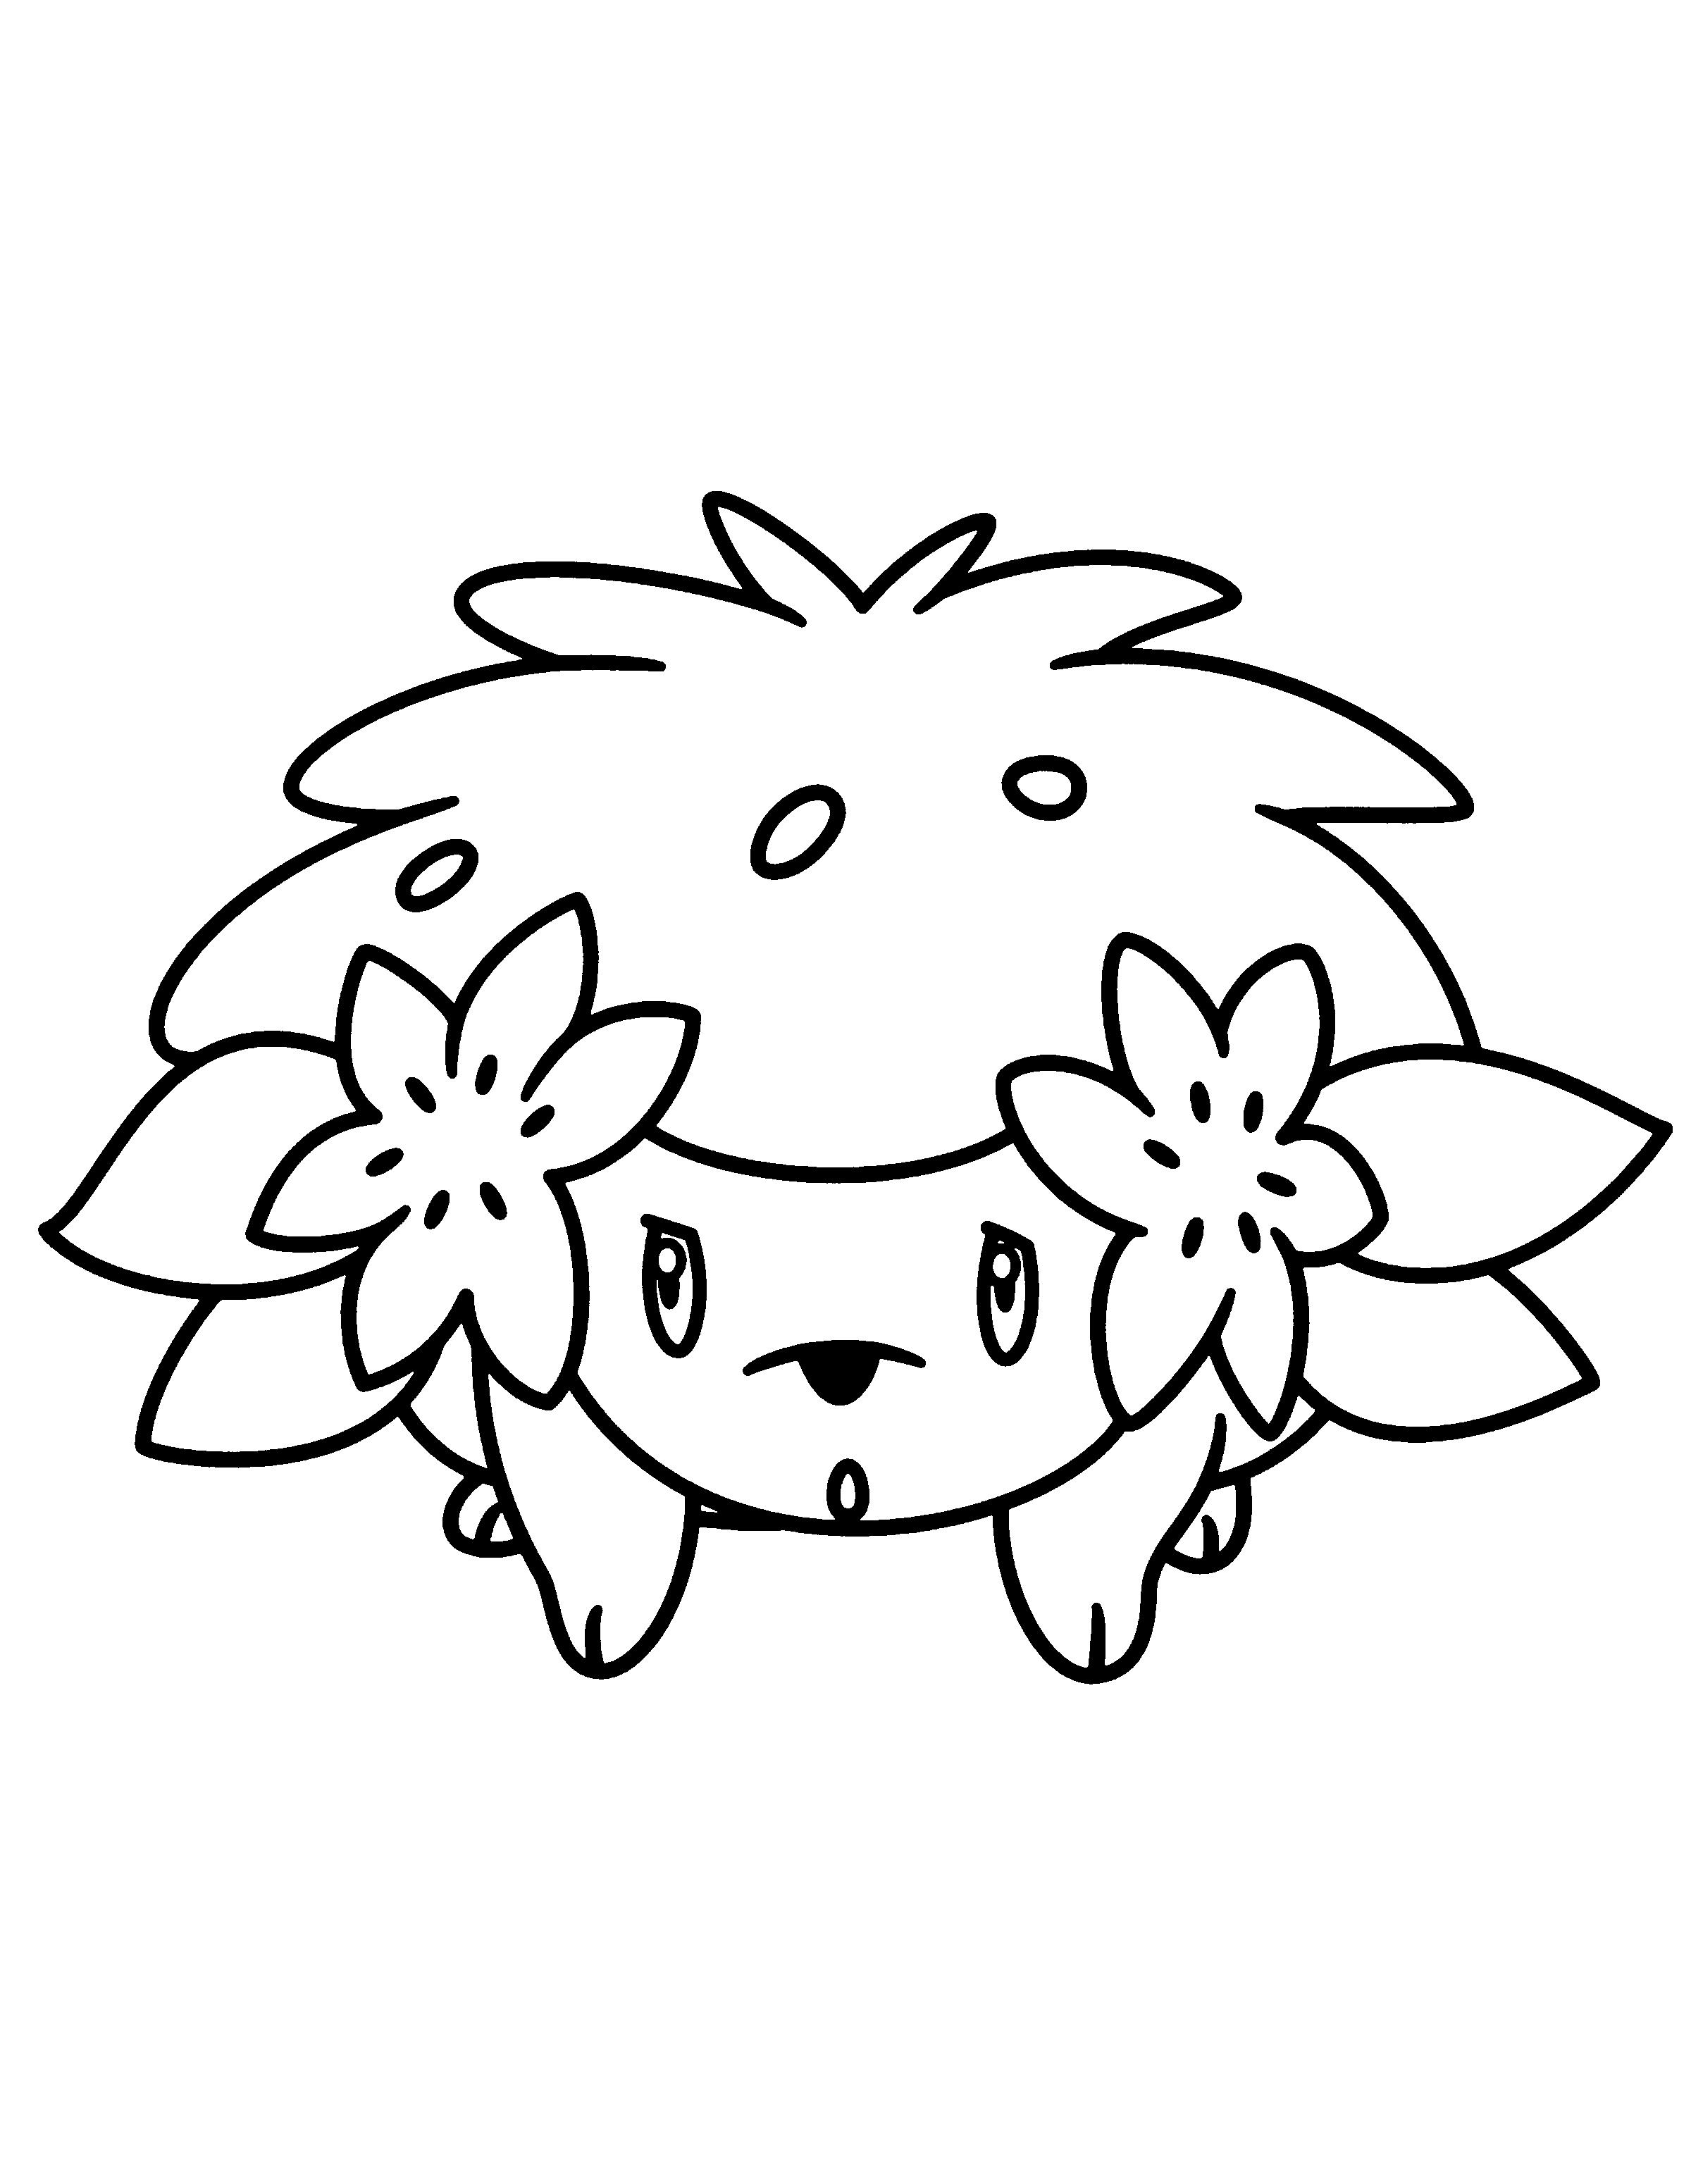 Kleurplaten Pokemon Zekrom.Dialga Coloring Pages At Getdrawings Com Free For Personal Use